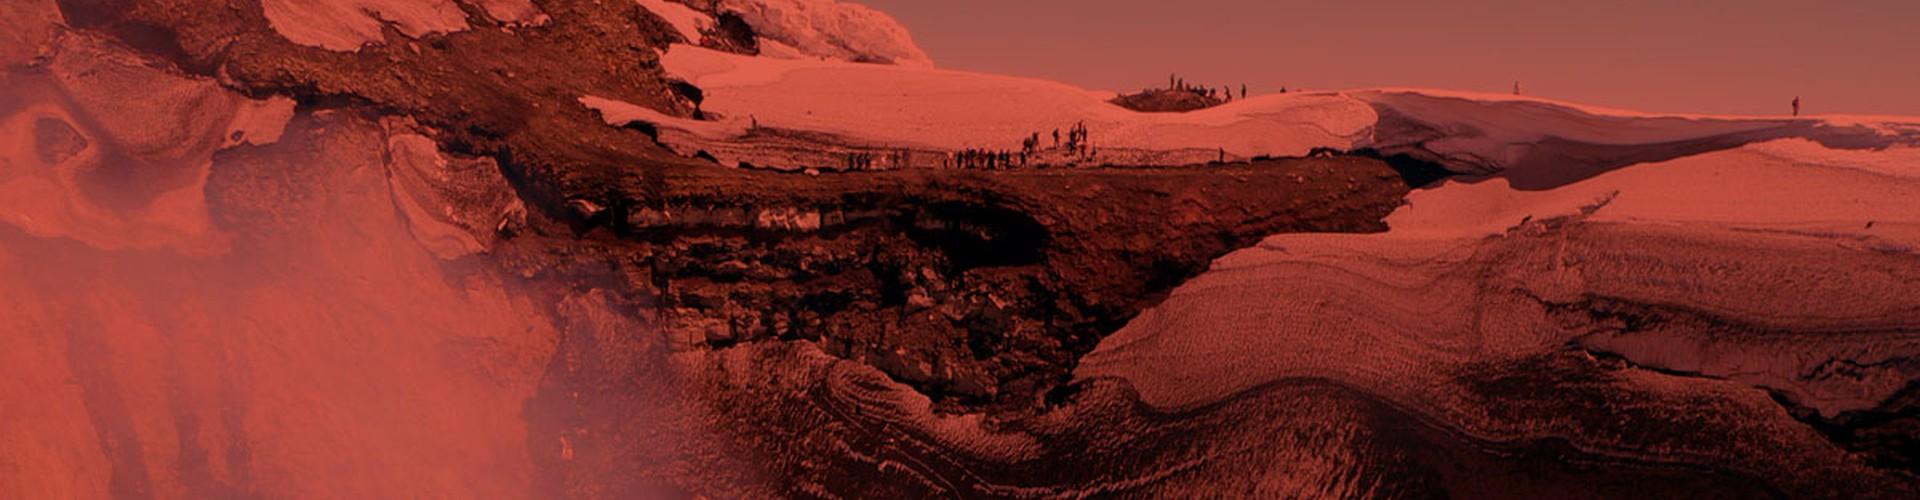 IAVCEI fieldtrip participants at Villarrica crater rim (Credit: Dávid Karátson, distributed via imaggeo.egu.eu)